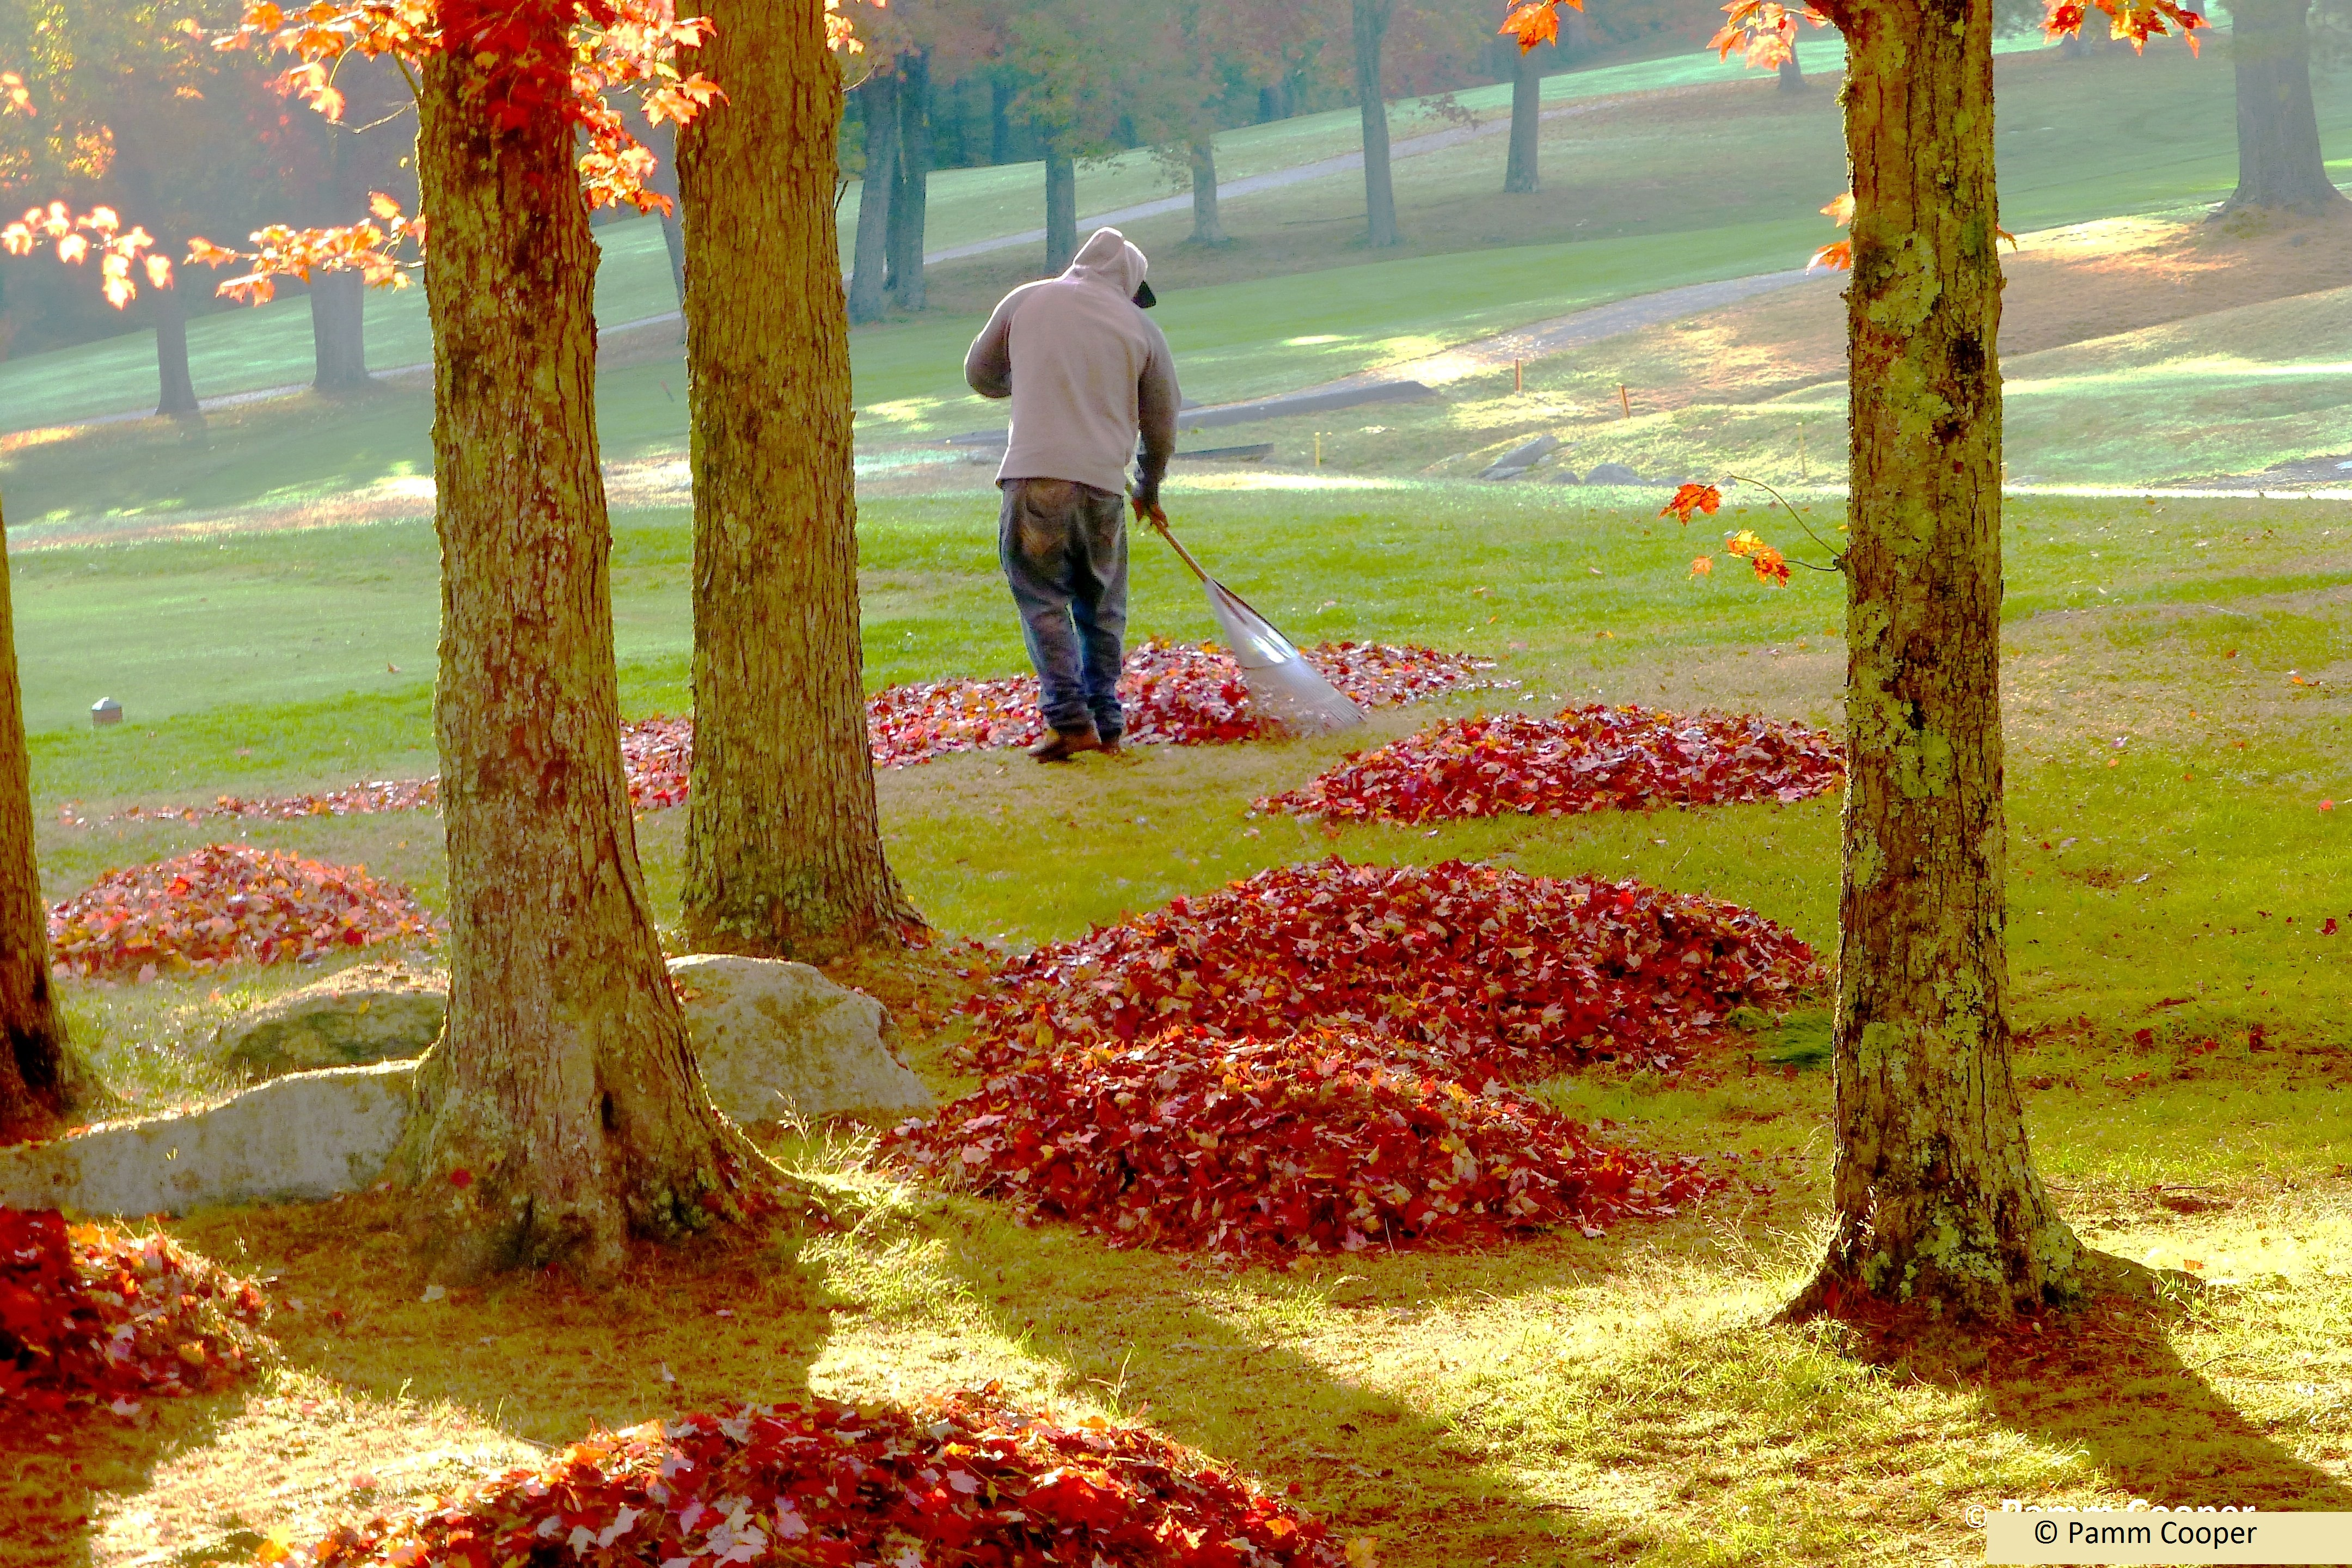 raking leaves abstract Pamm Cooper photo